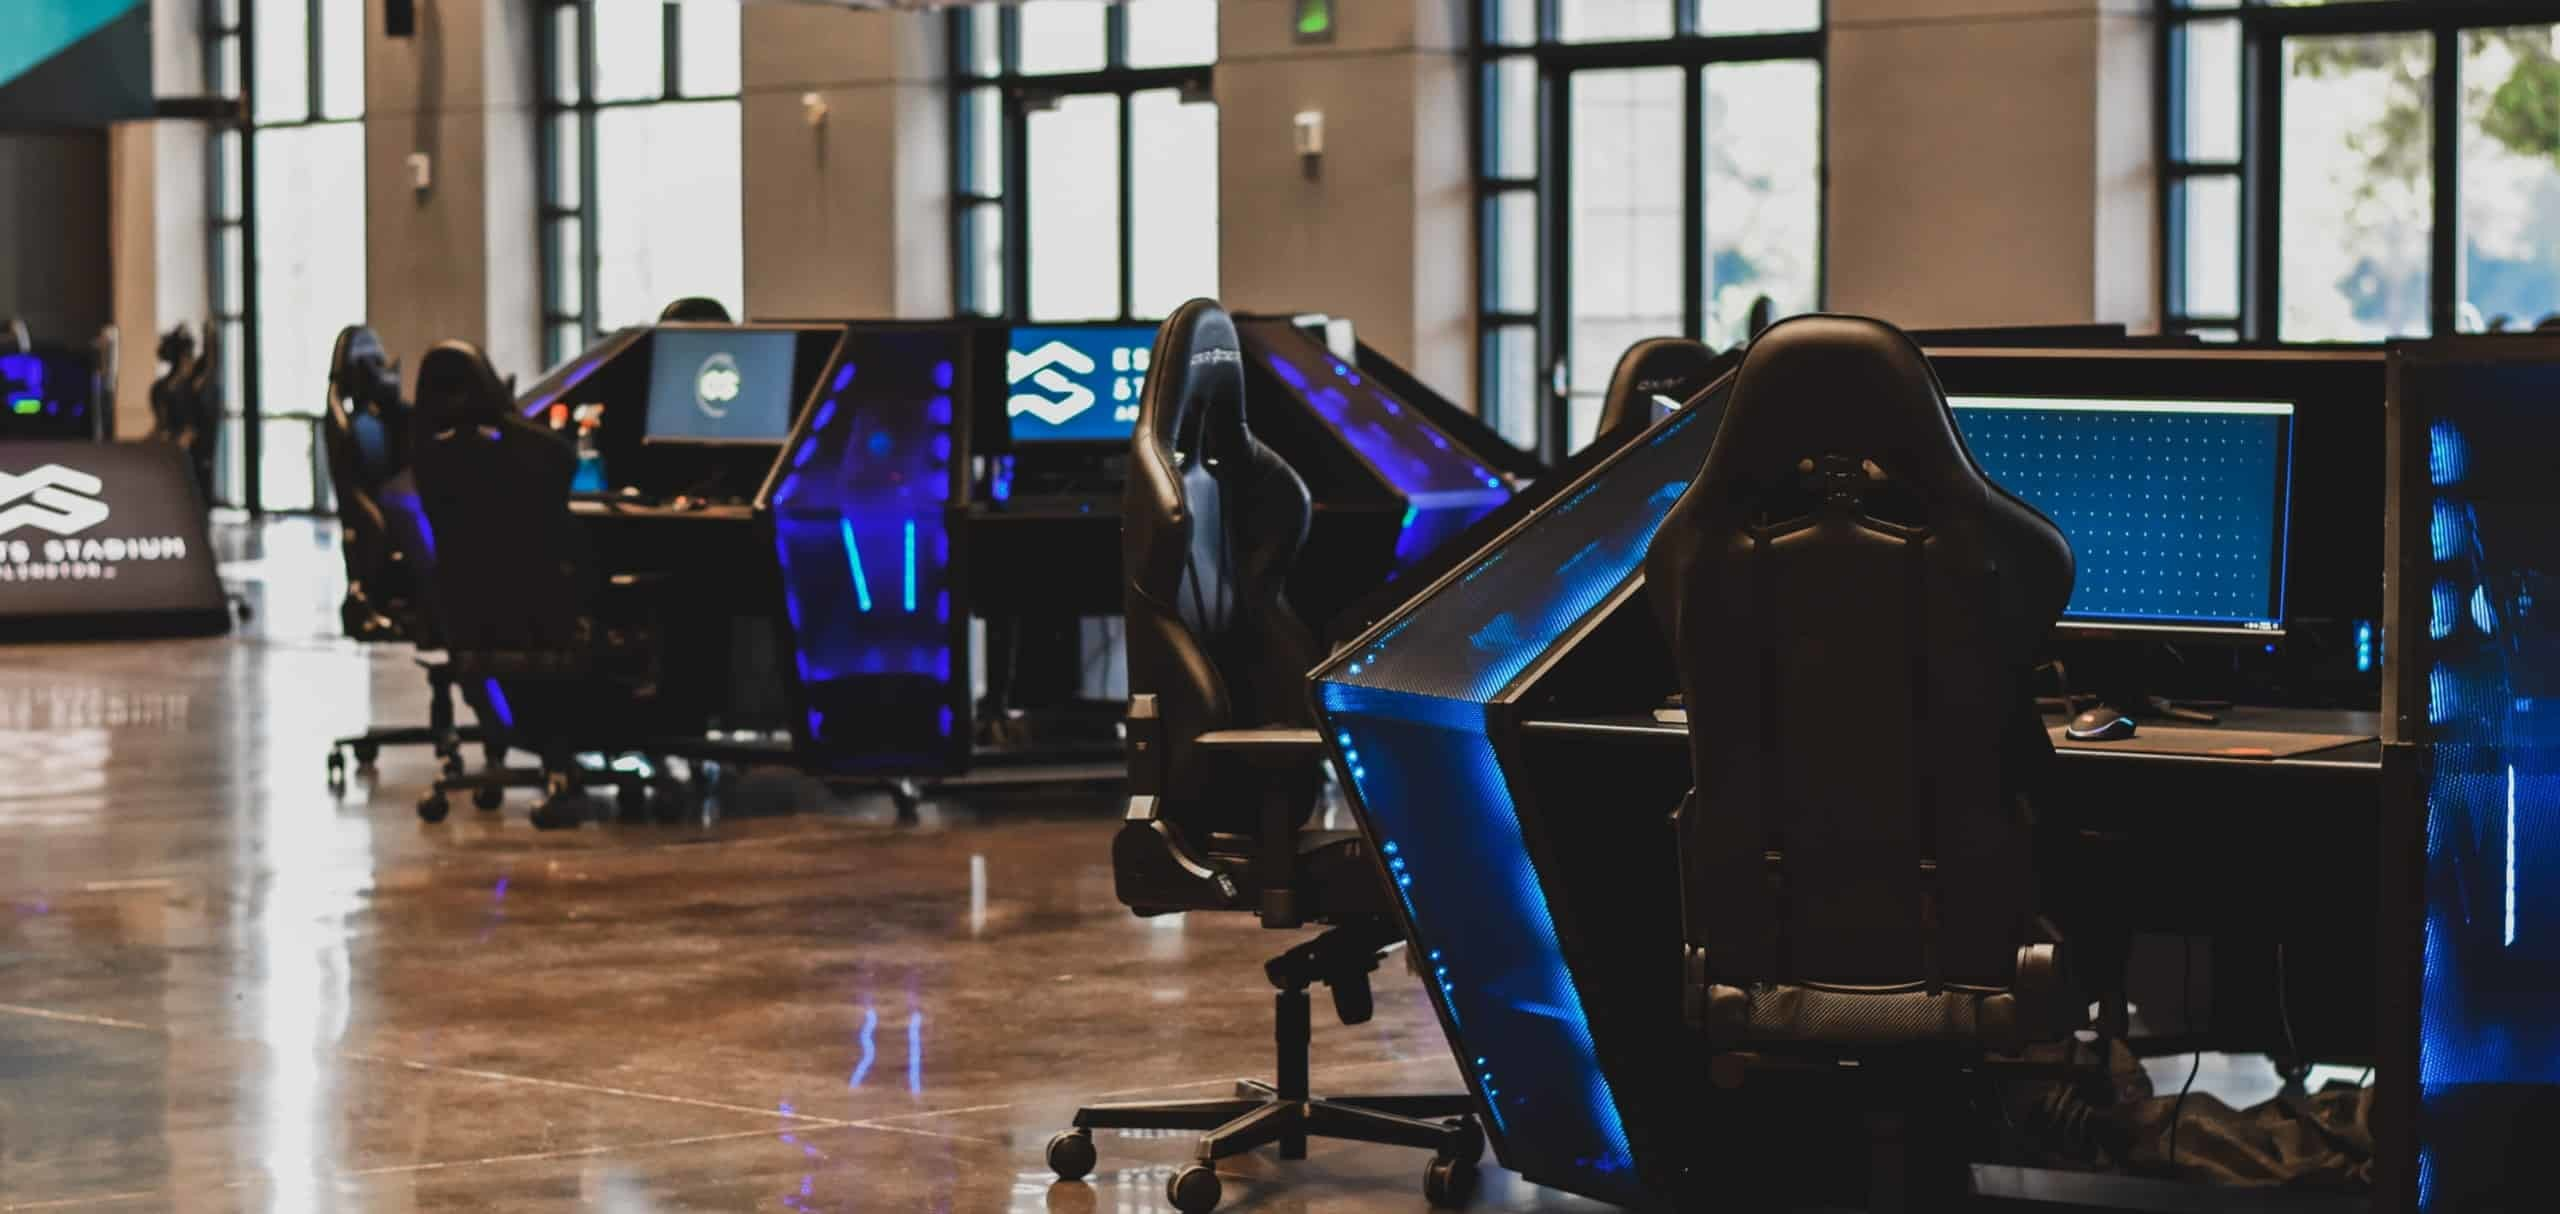 مركز تدريب رياضات الكترونية 13 مليون tsm training center gaming esports pc lenovo la